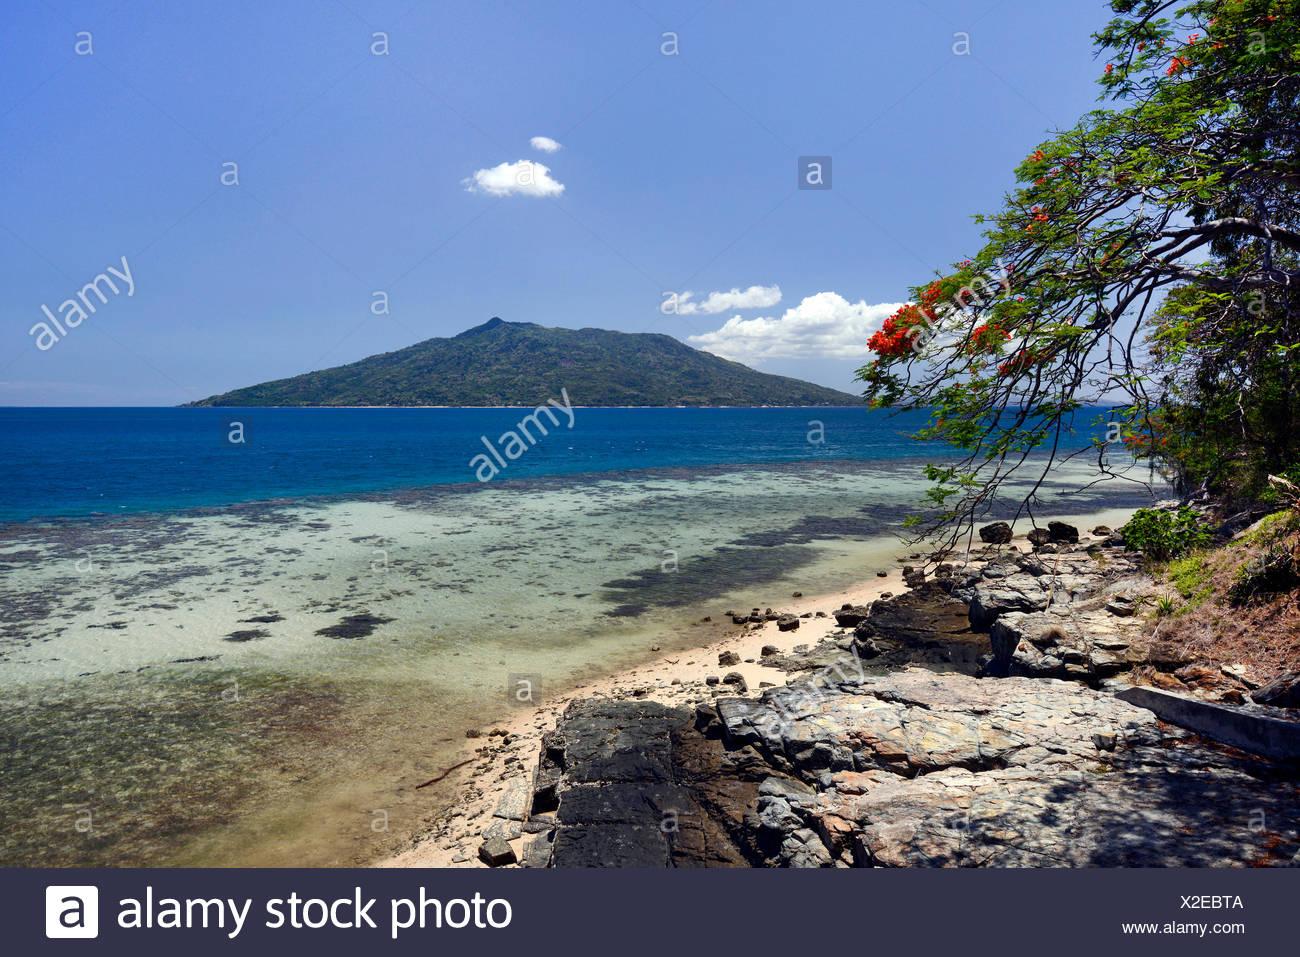 Royal poinciana, Flamboyant, Flame tree (Delonix regia), dream beach at the coast of Ankifi with view to Nosy Komba, Madagascar, Ankifi - Stock Image